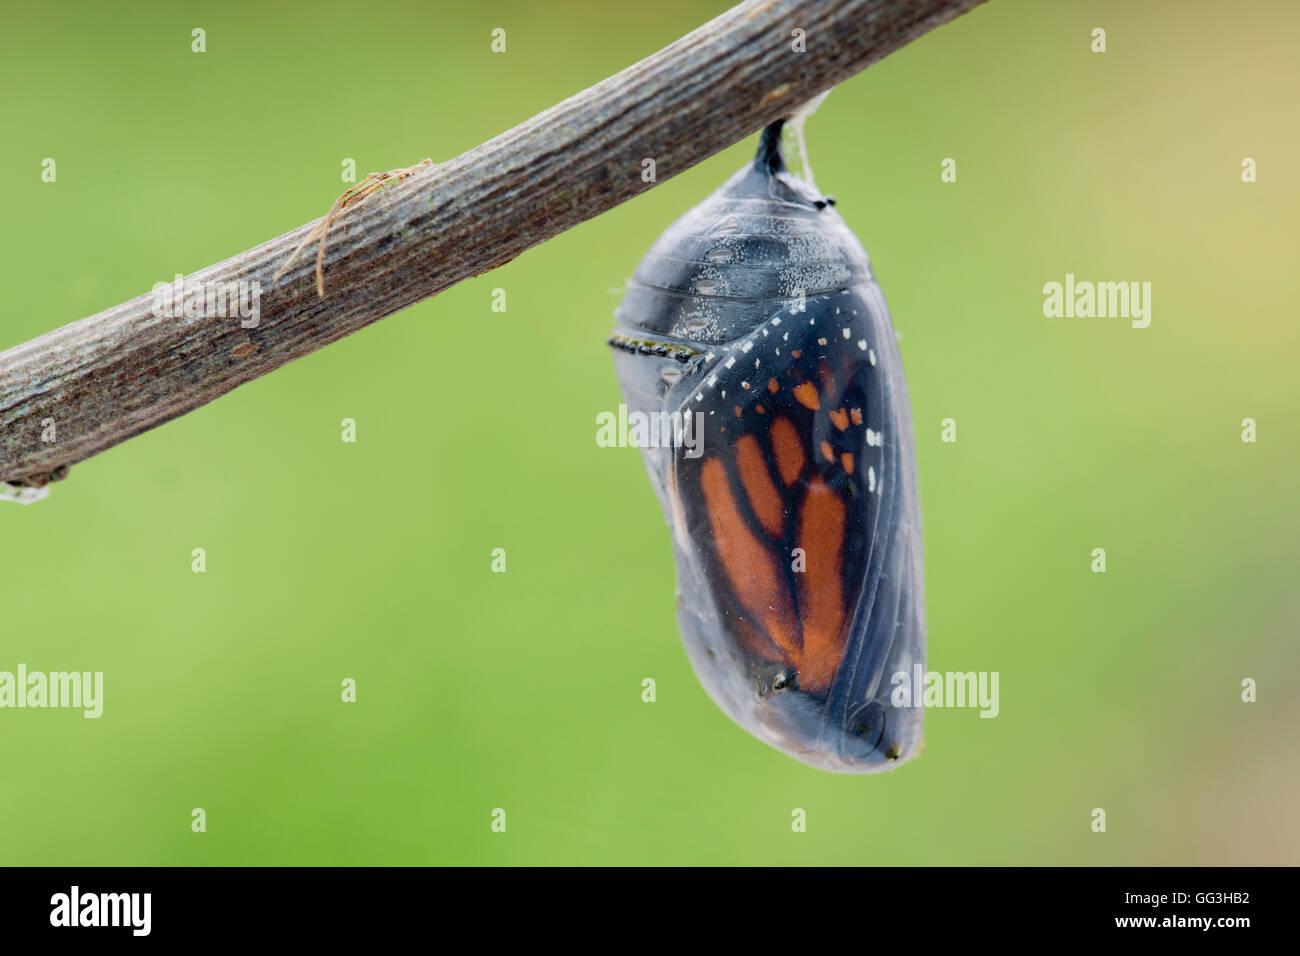 Pupa de la Mariposa Monarca, Danaus plexippus UK Imagen De Stock